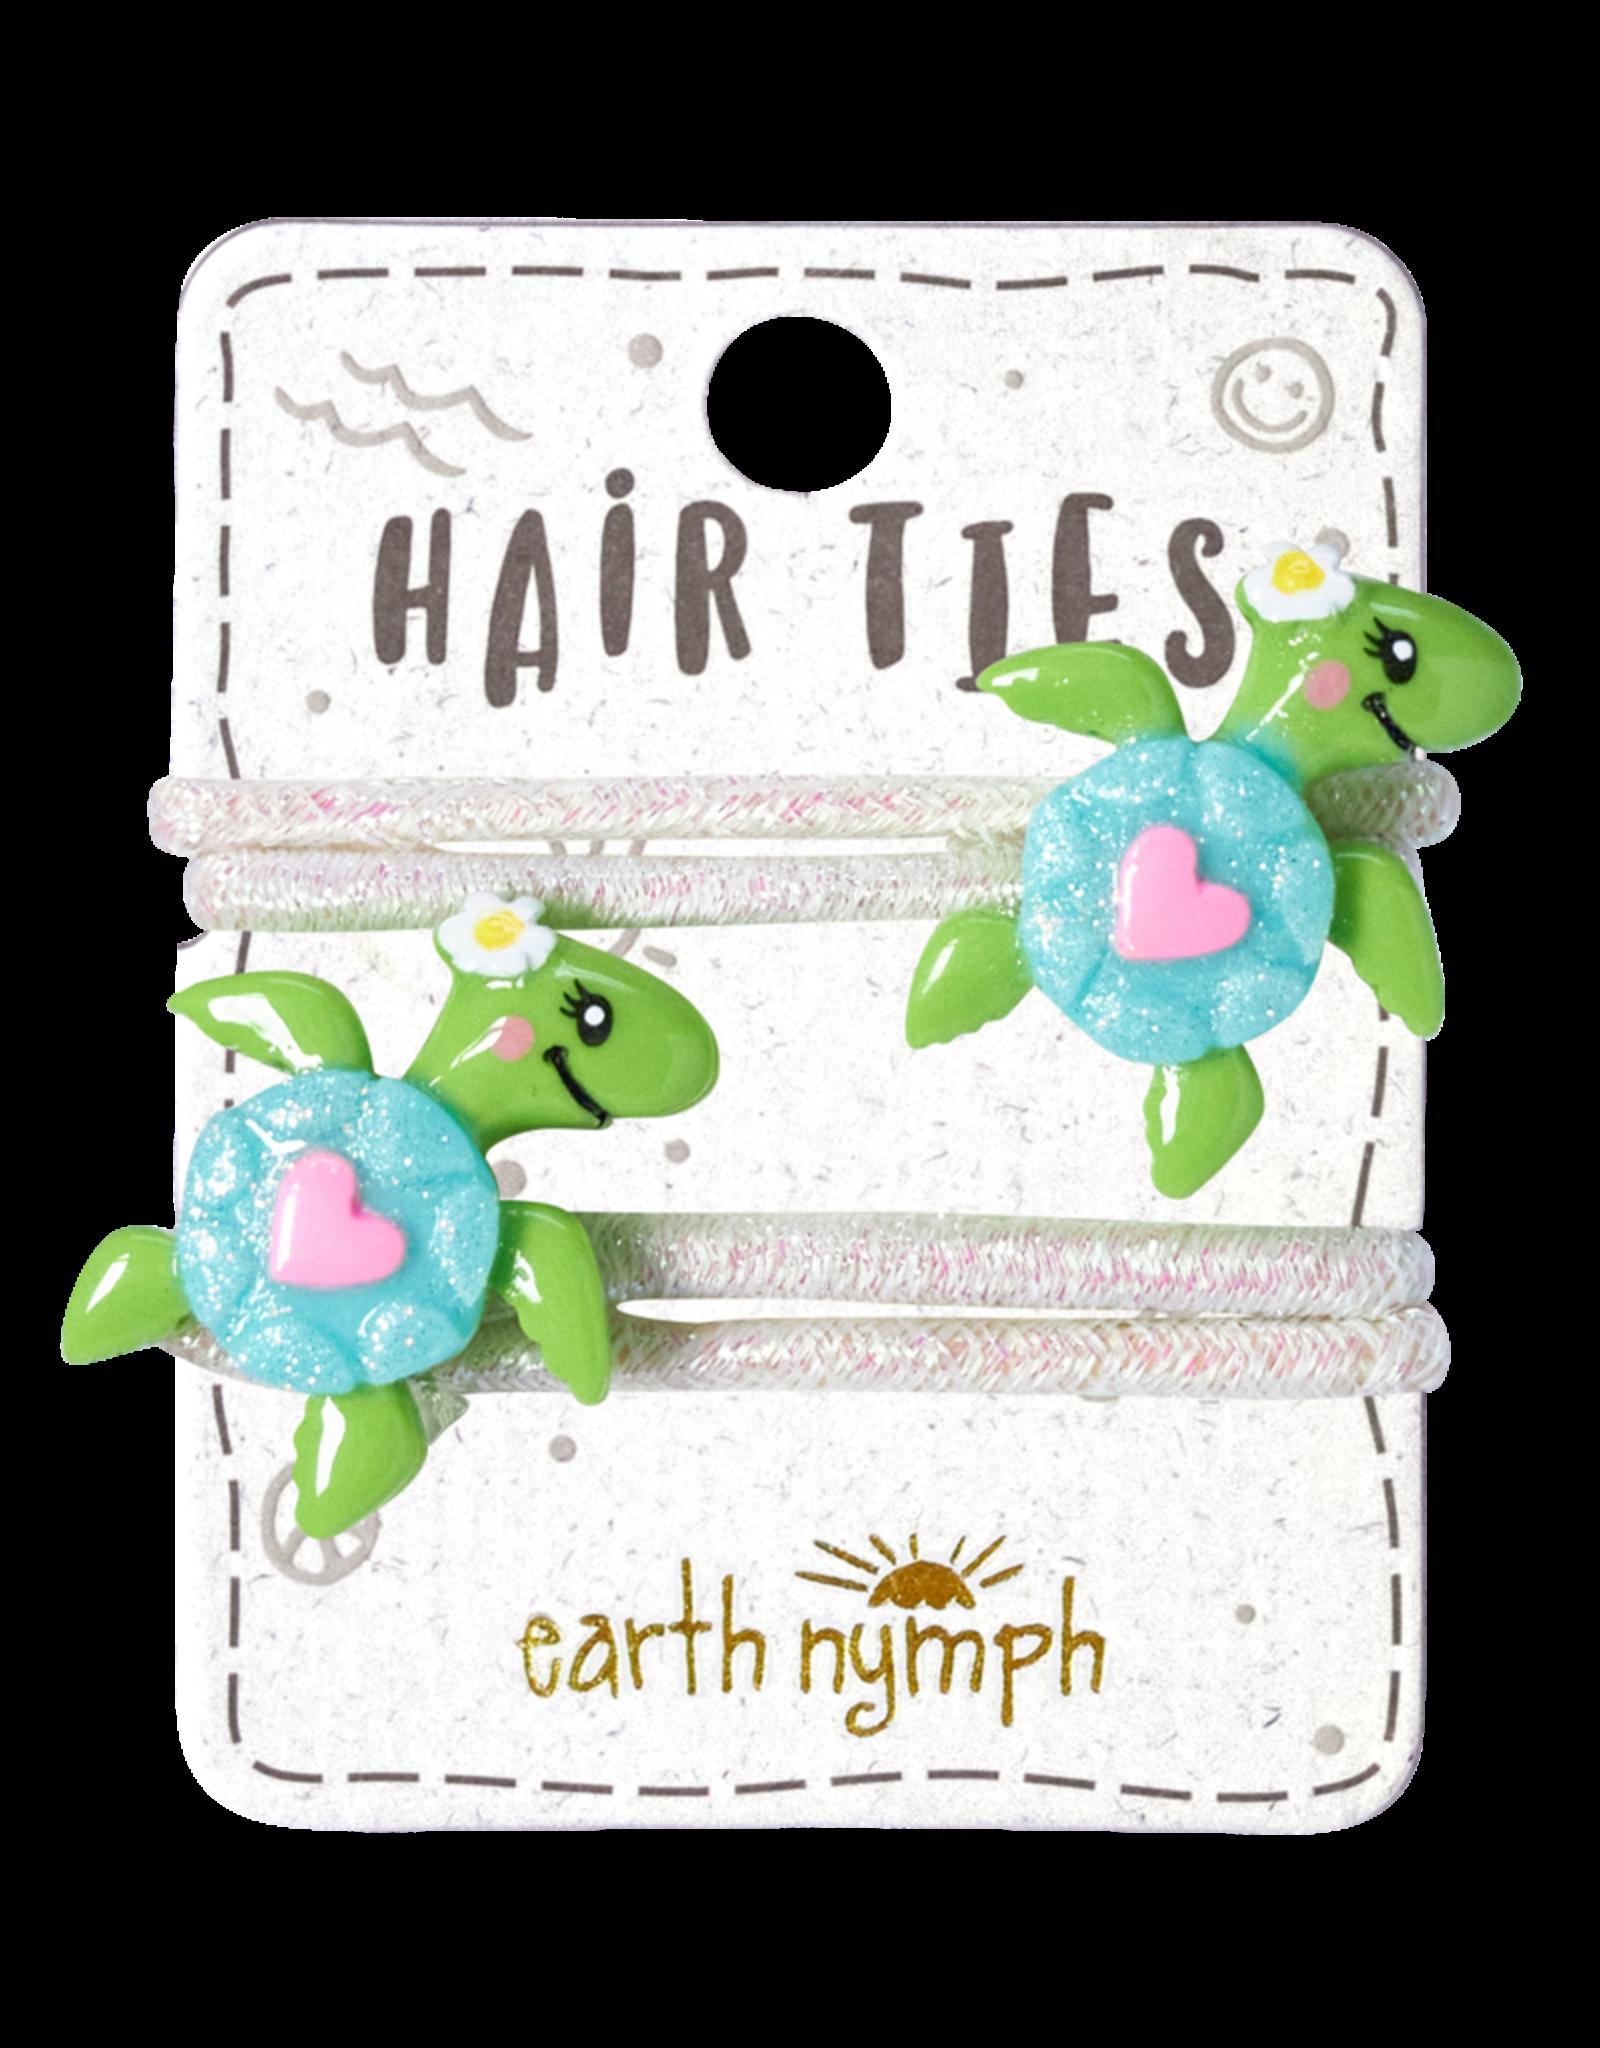 EARTH NYMPH EARTH NYMPH HAIR TIES